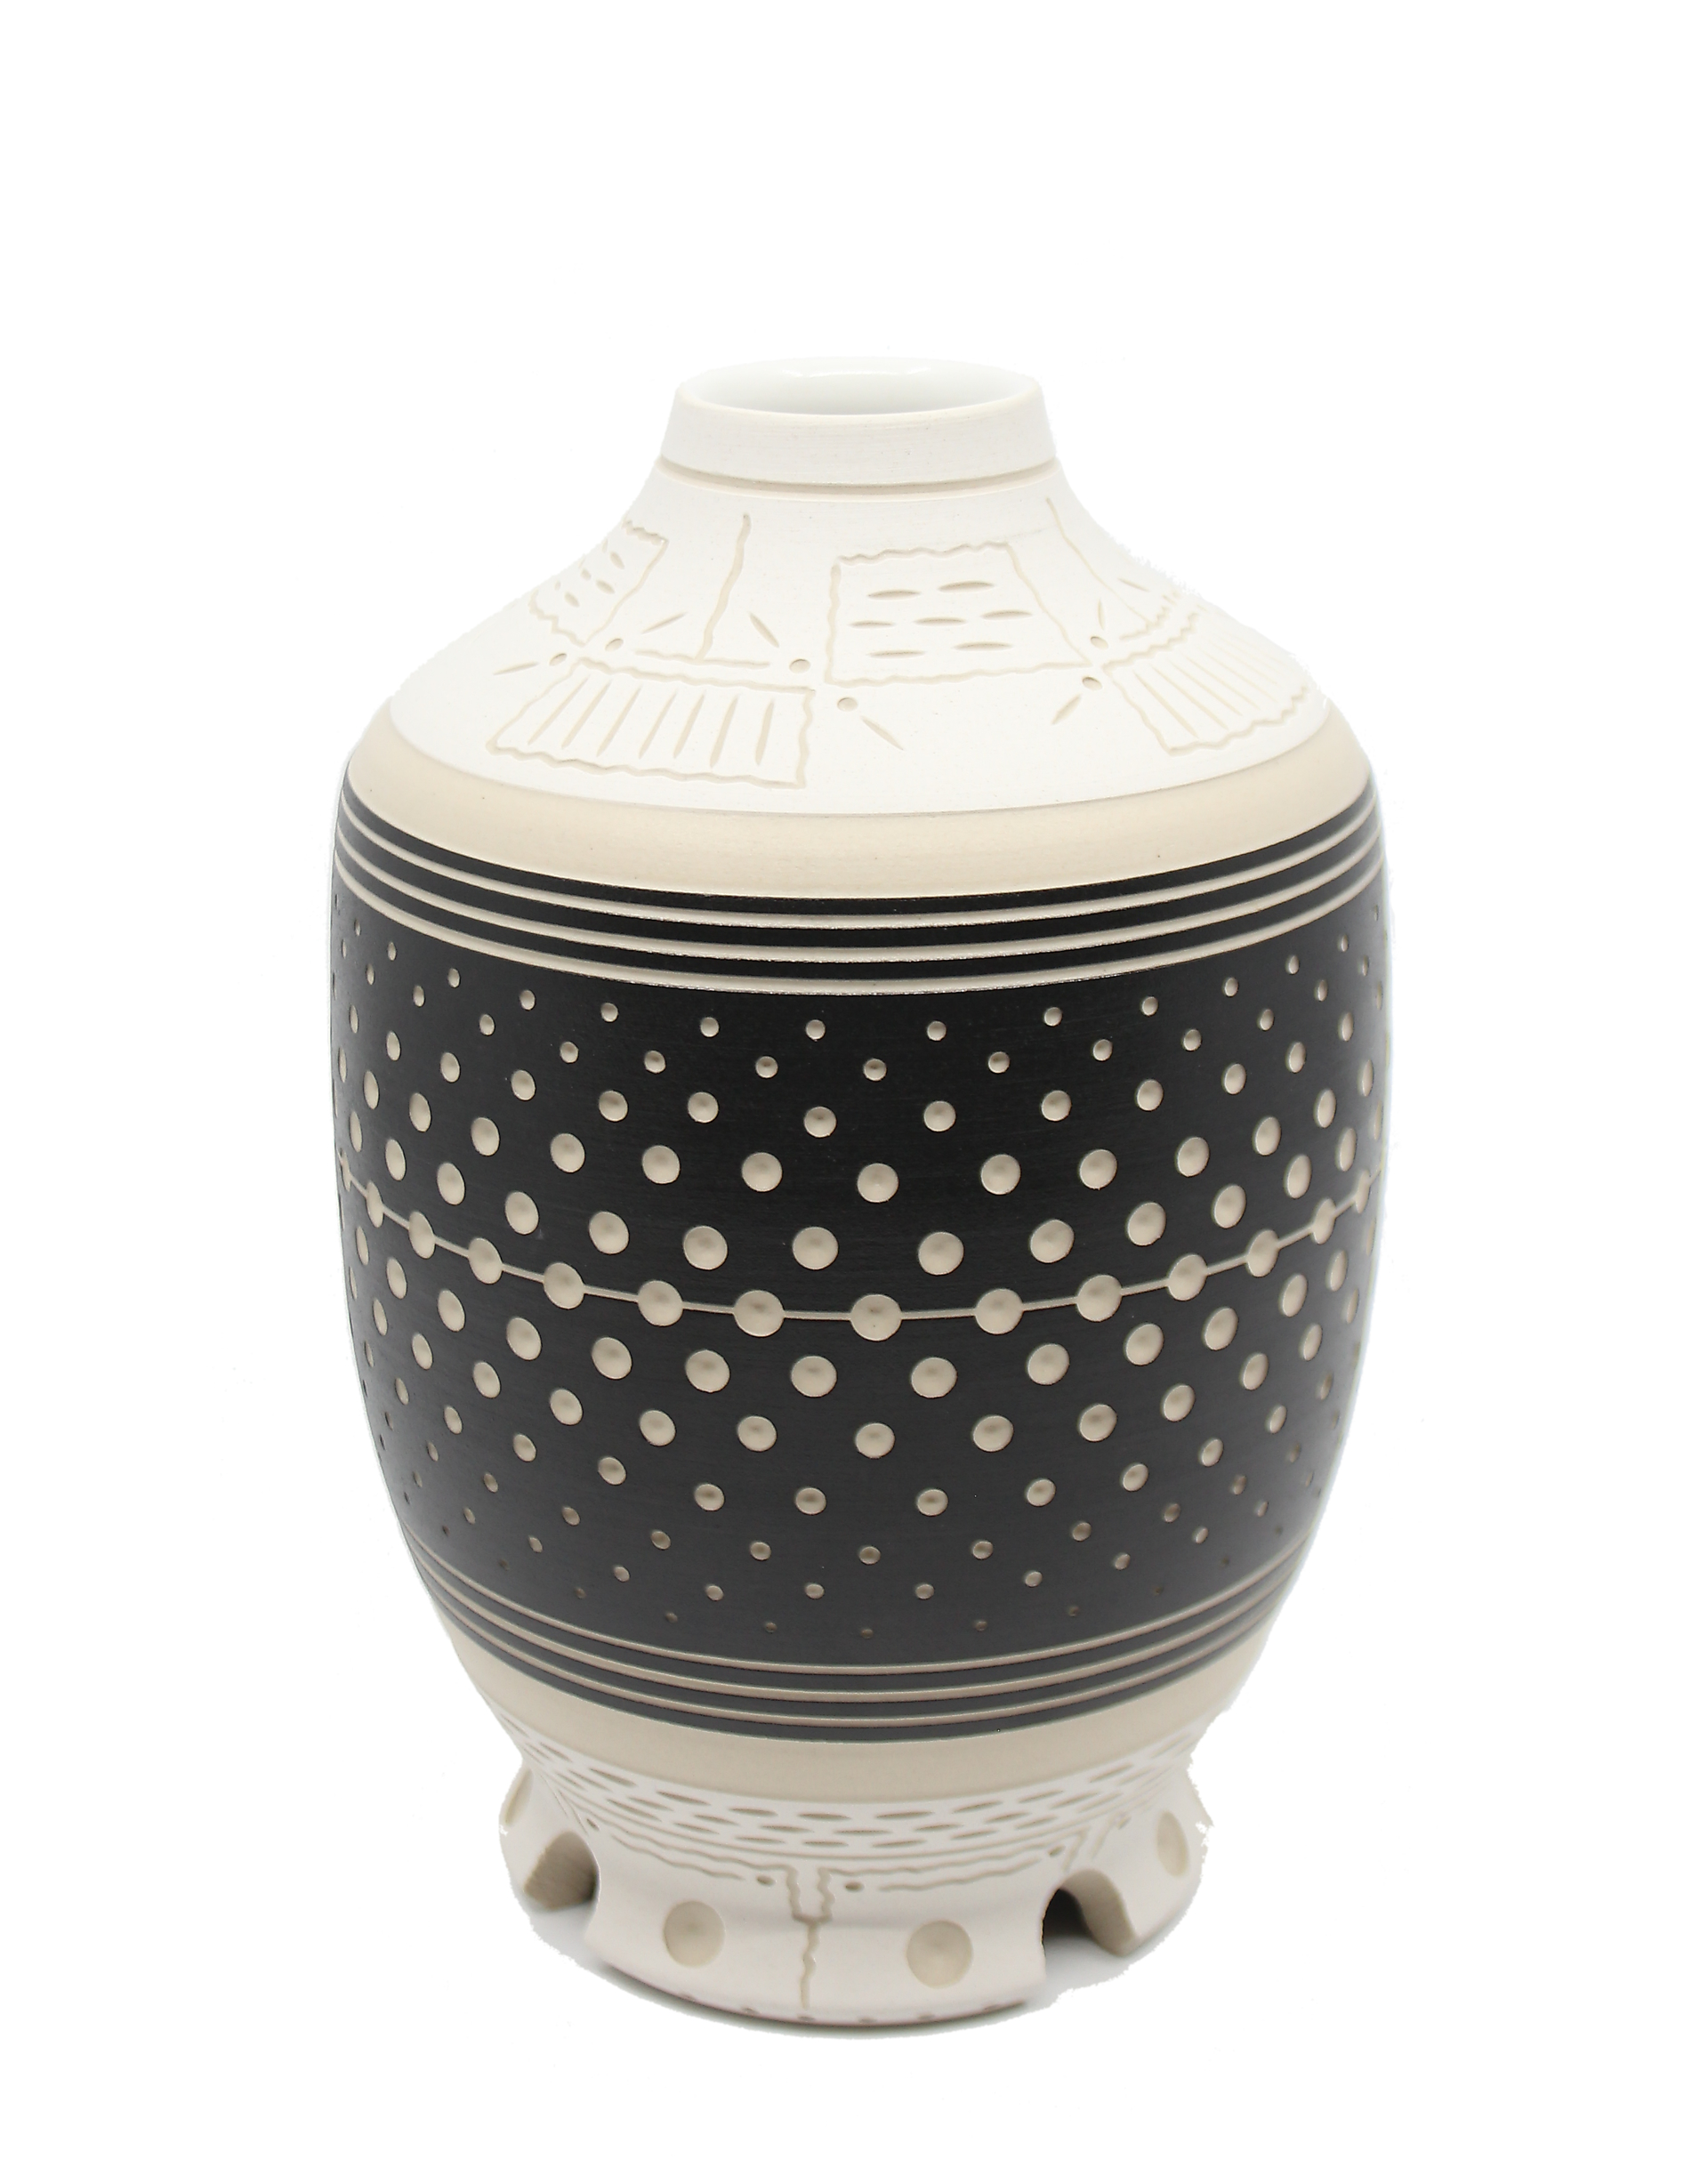 Black & White Vase by Chris Casey